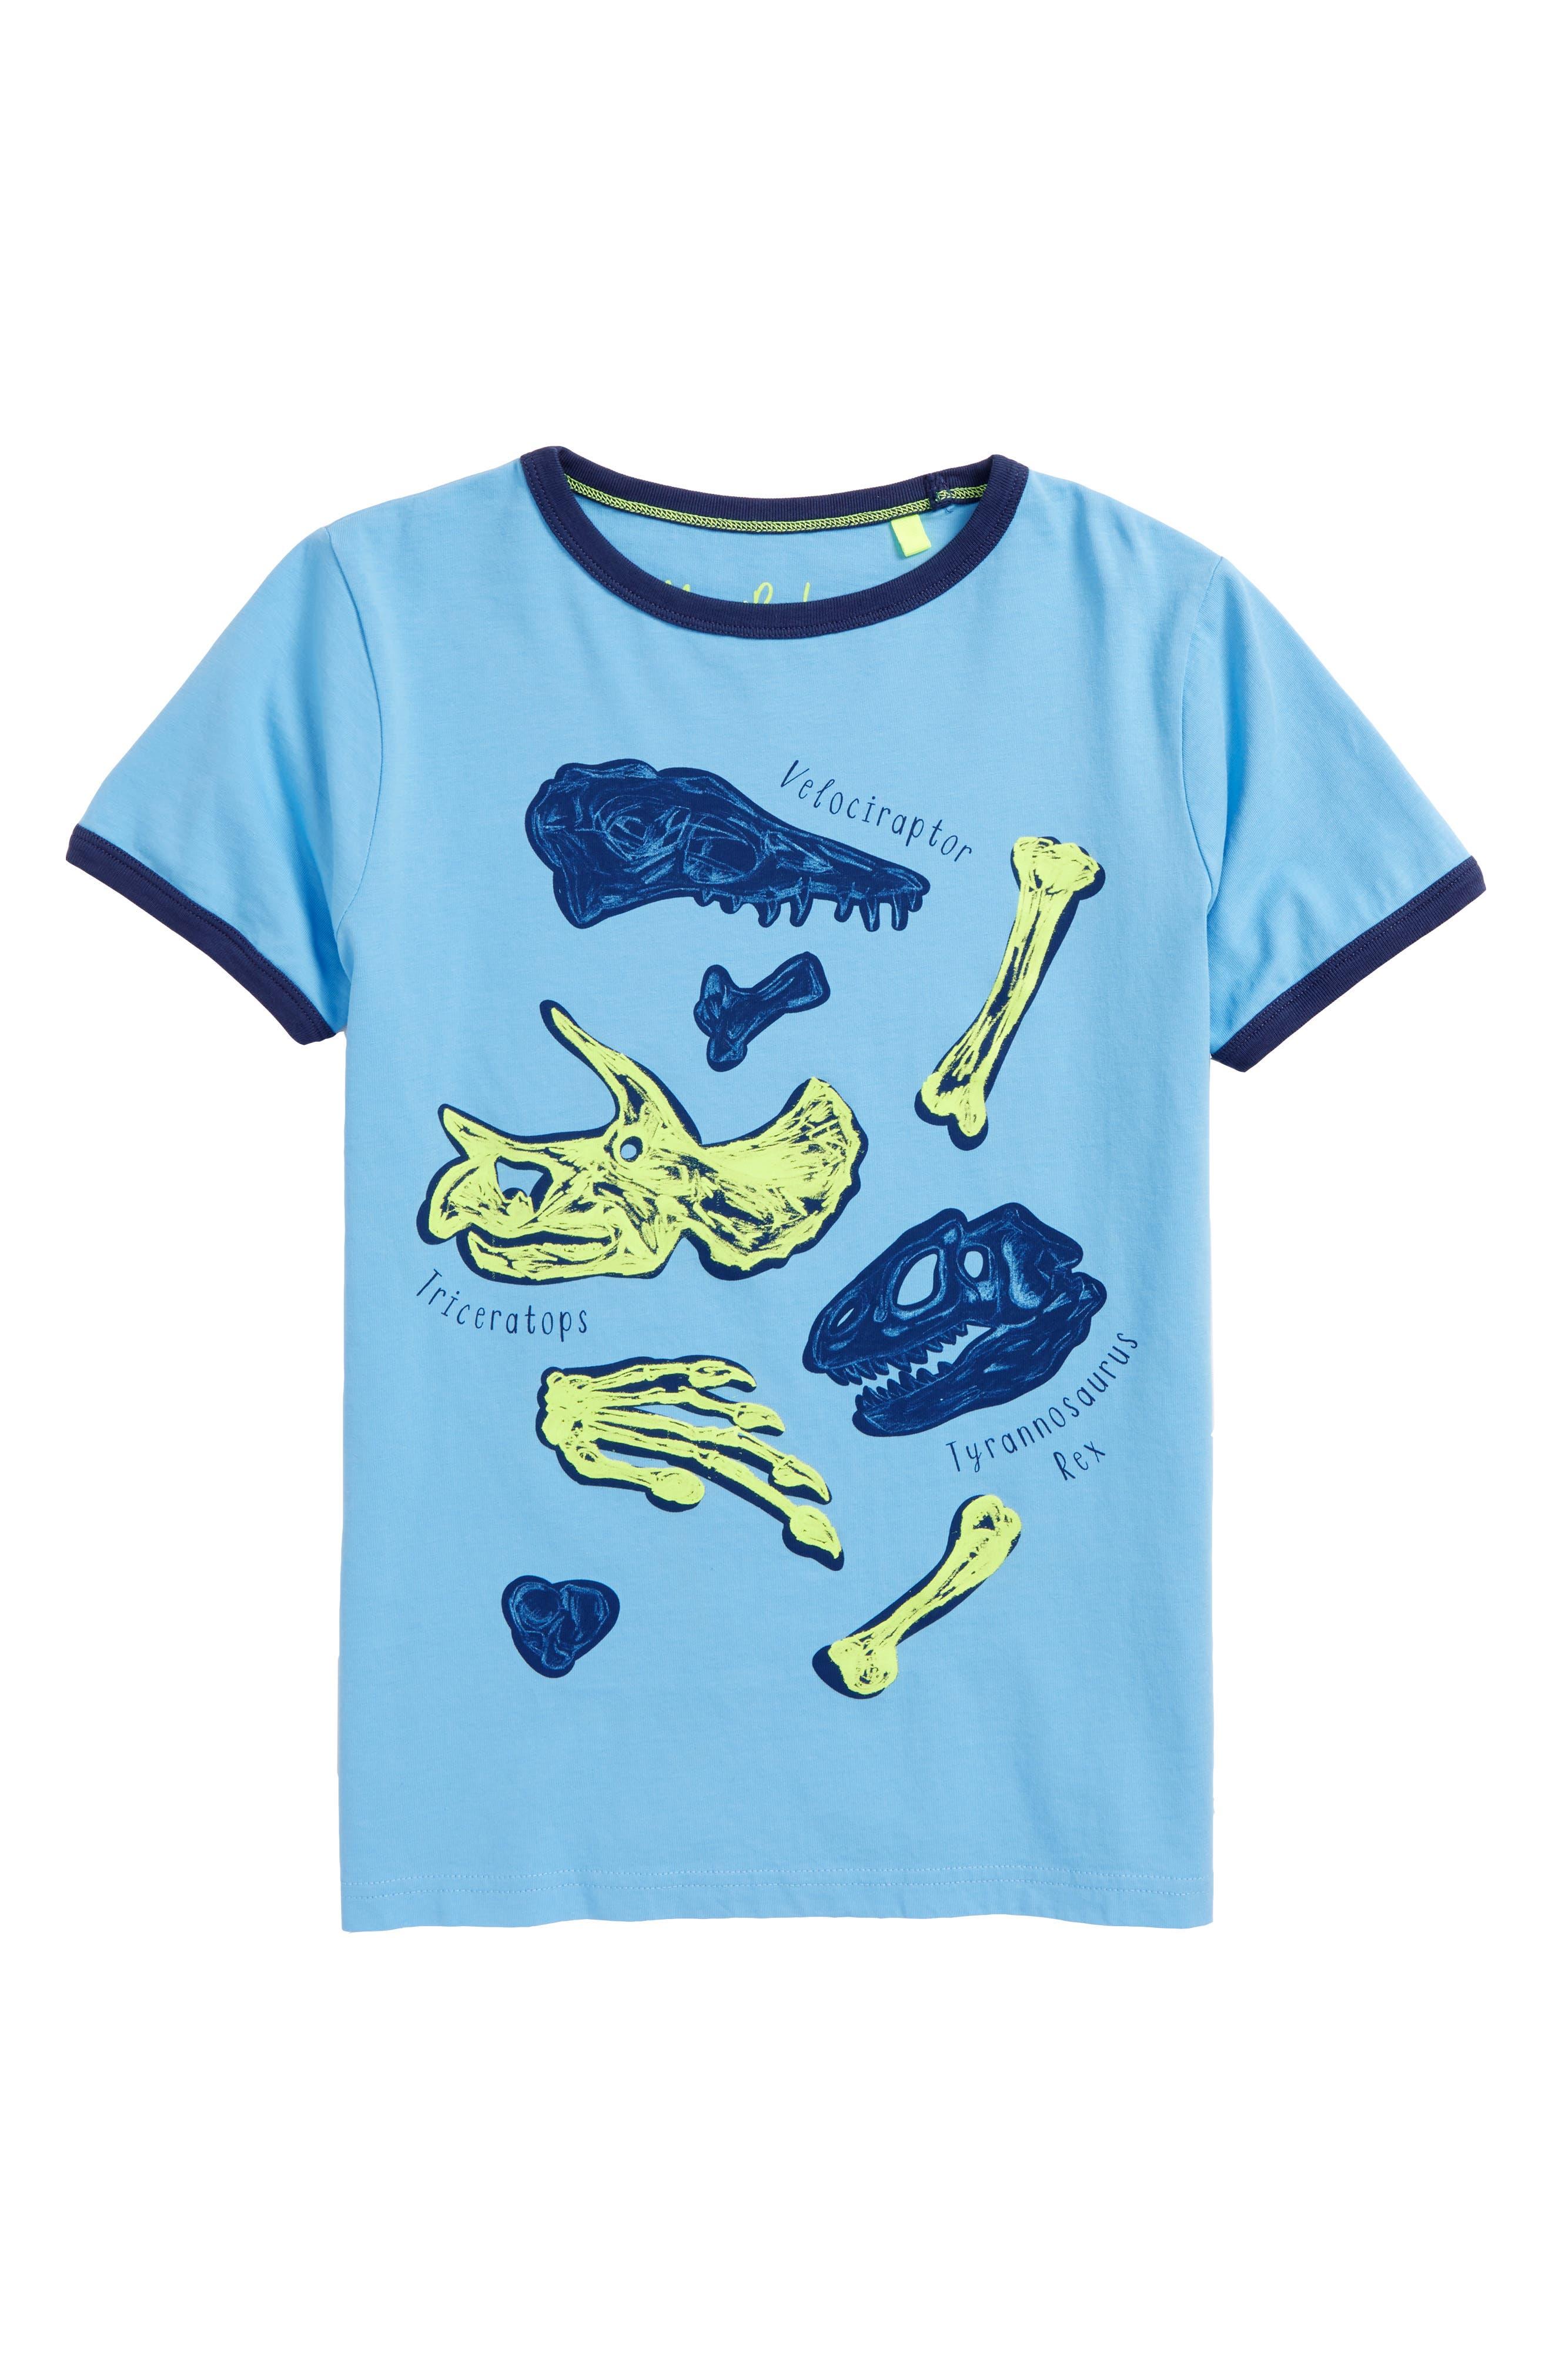 Educational Dinosaur T-Shirt,                             Main thumbnail 1, color,                             Surfboard Blue Dino